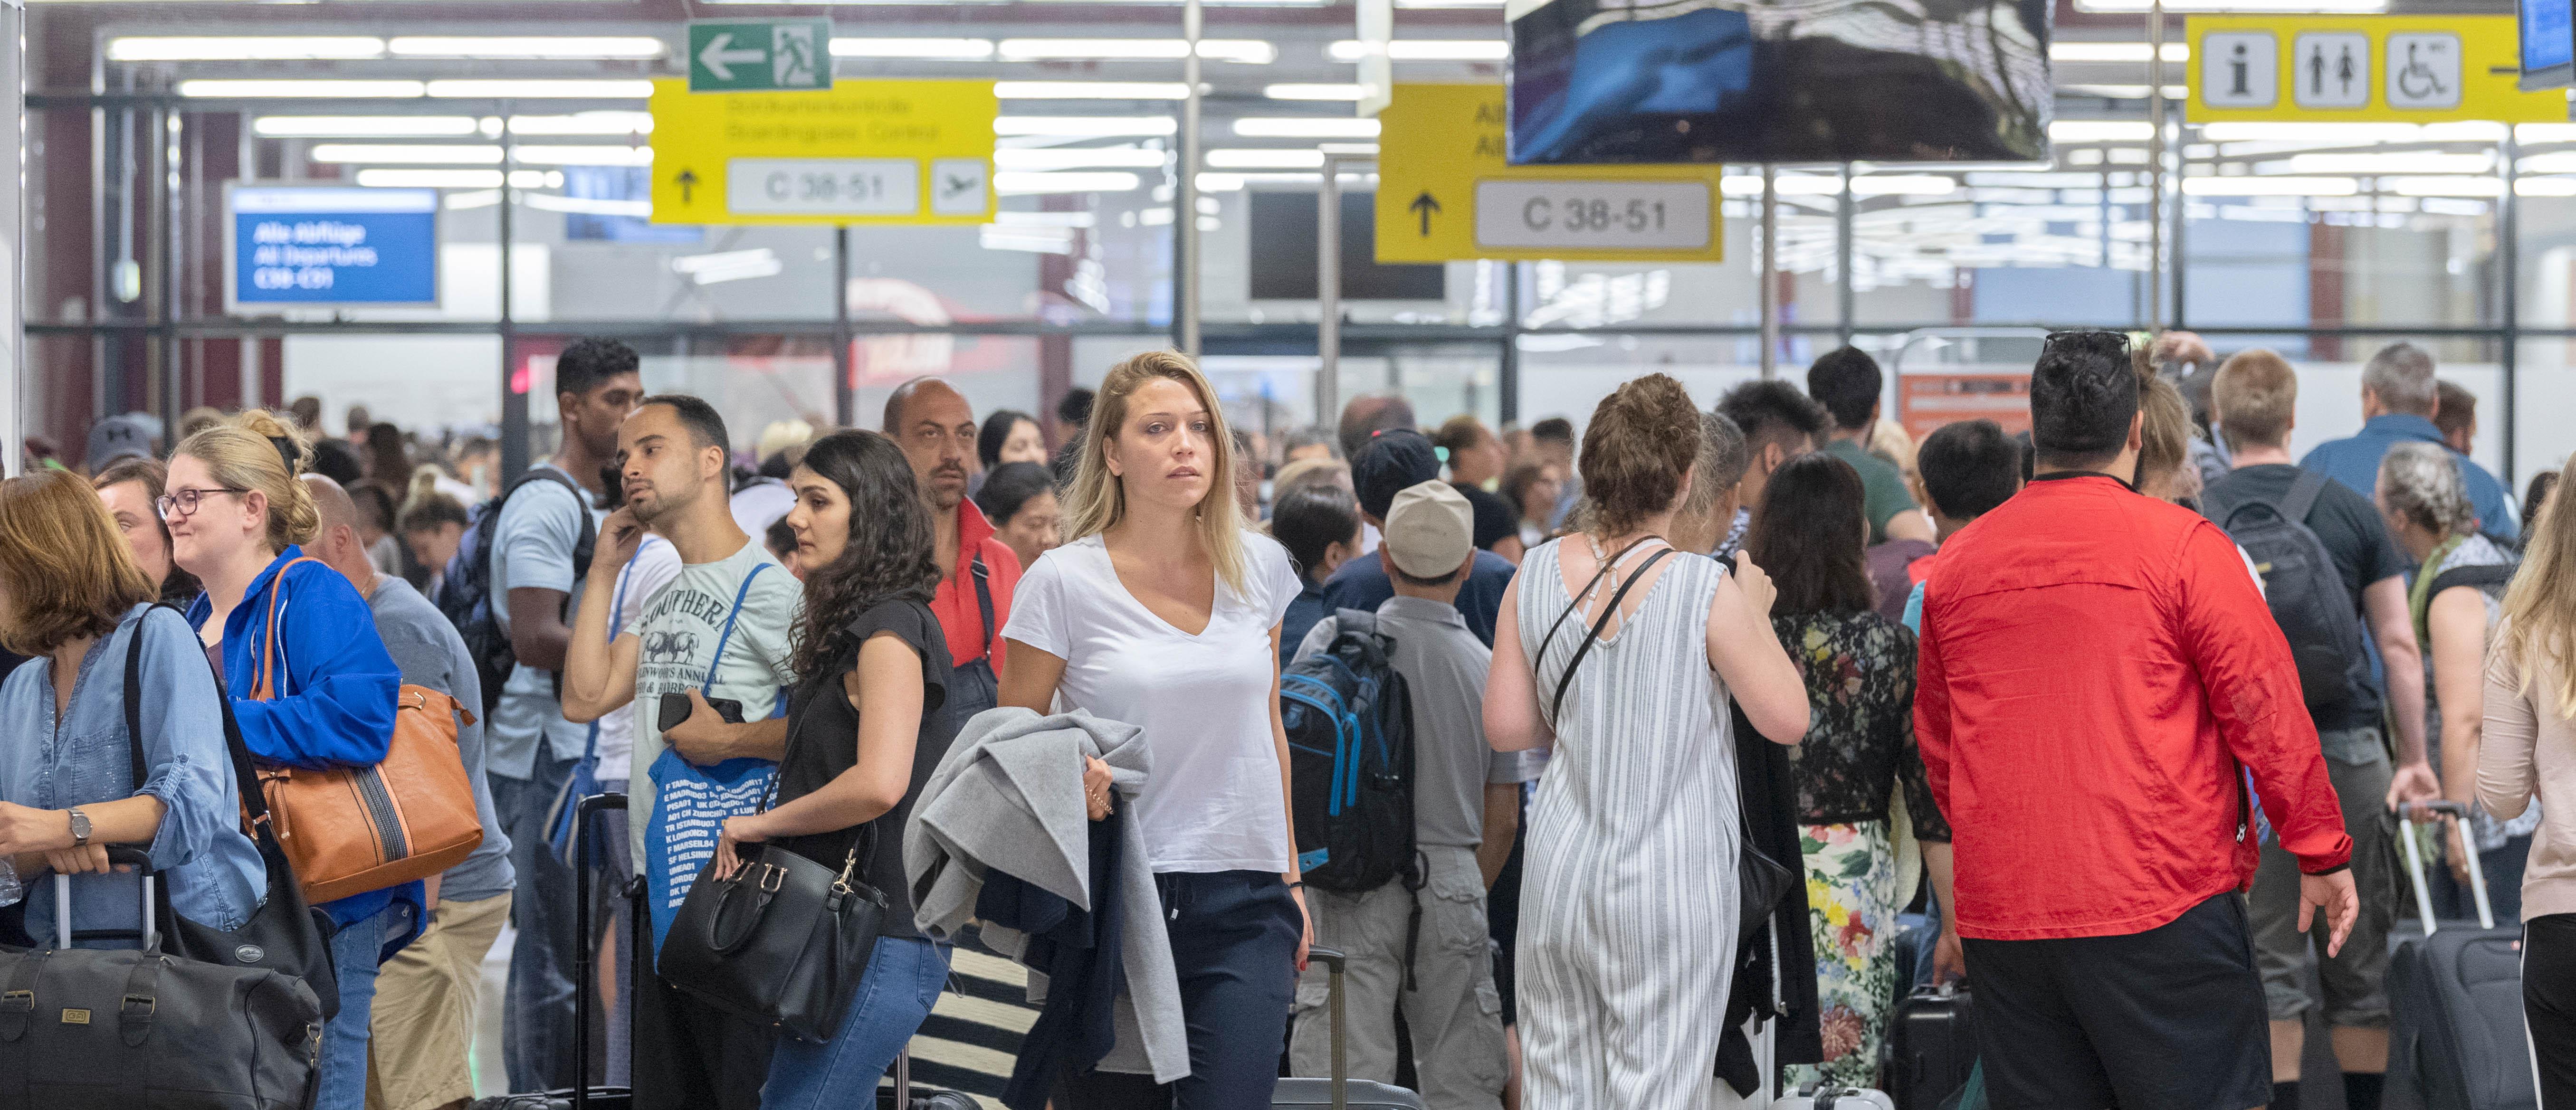 Passagierrekord 2018 mit fast 35 Millionen Passagieren